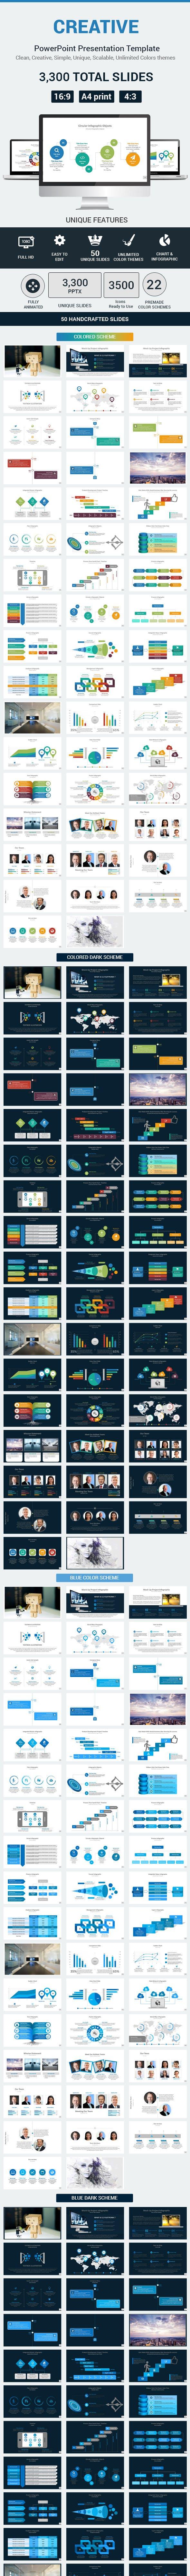 creative powerpoint presentation template by rainstudio graphicriver